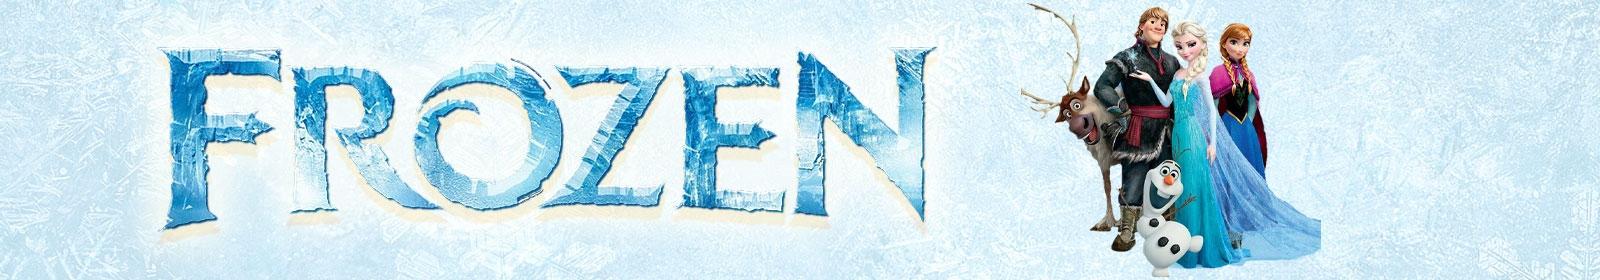 Comprar juguetes Frozen  online | Envios Gratis desde 49€